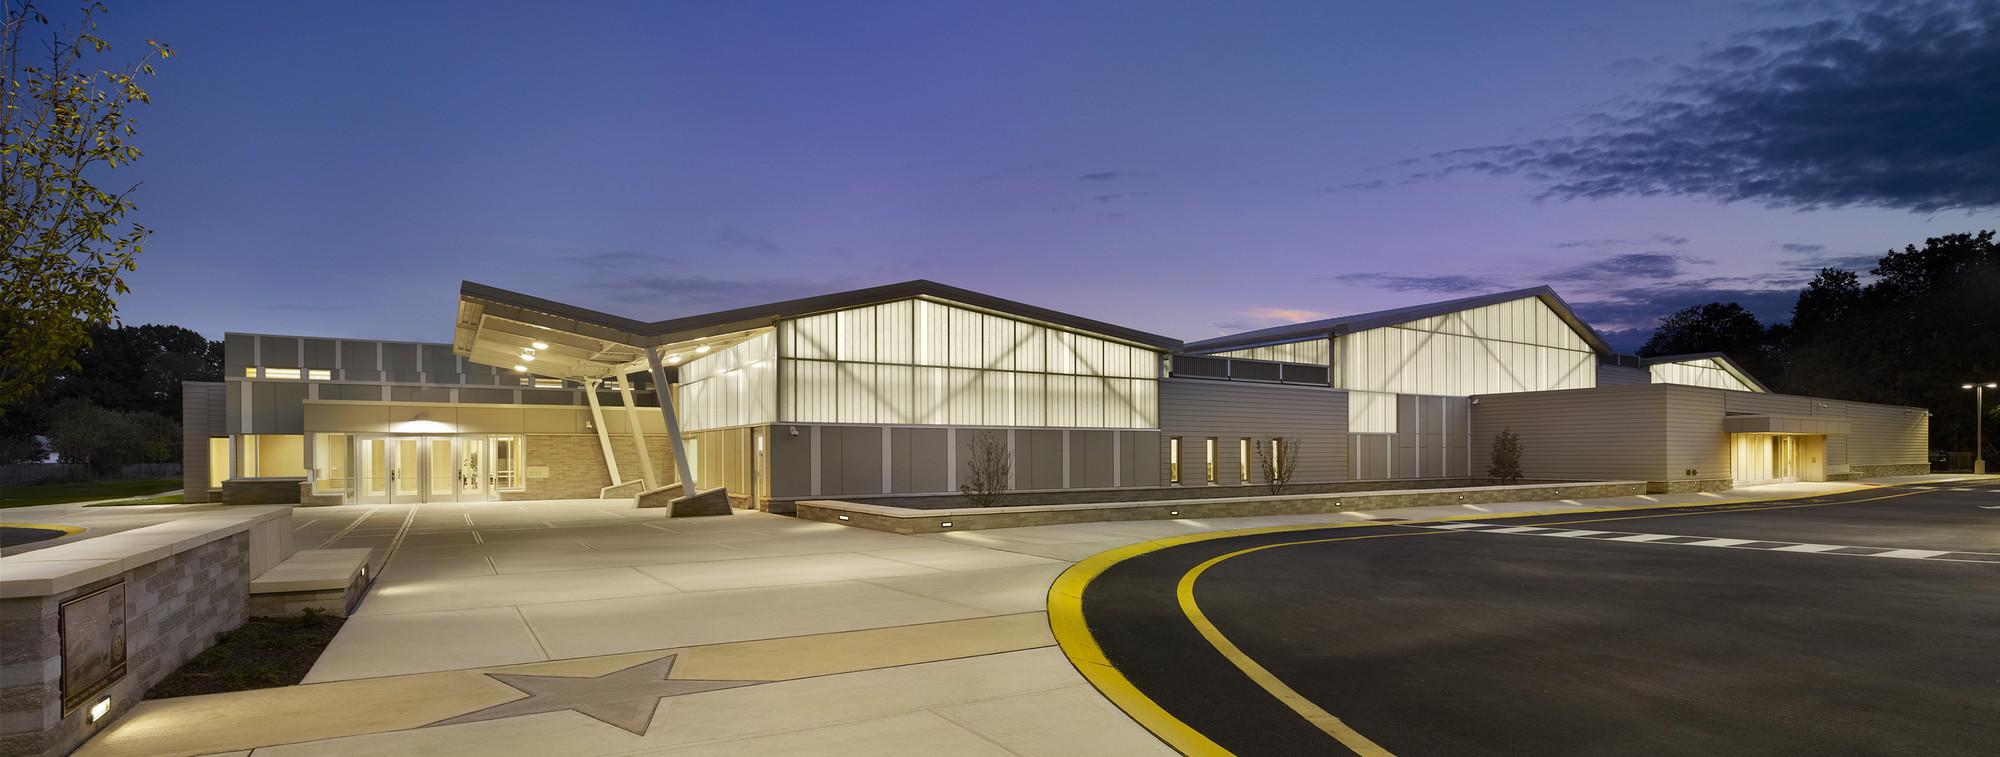 architecture school admission essay